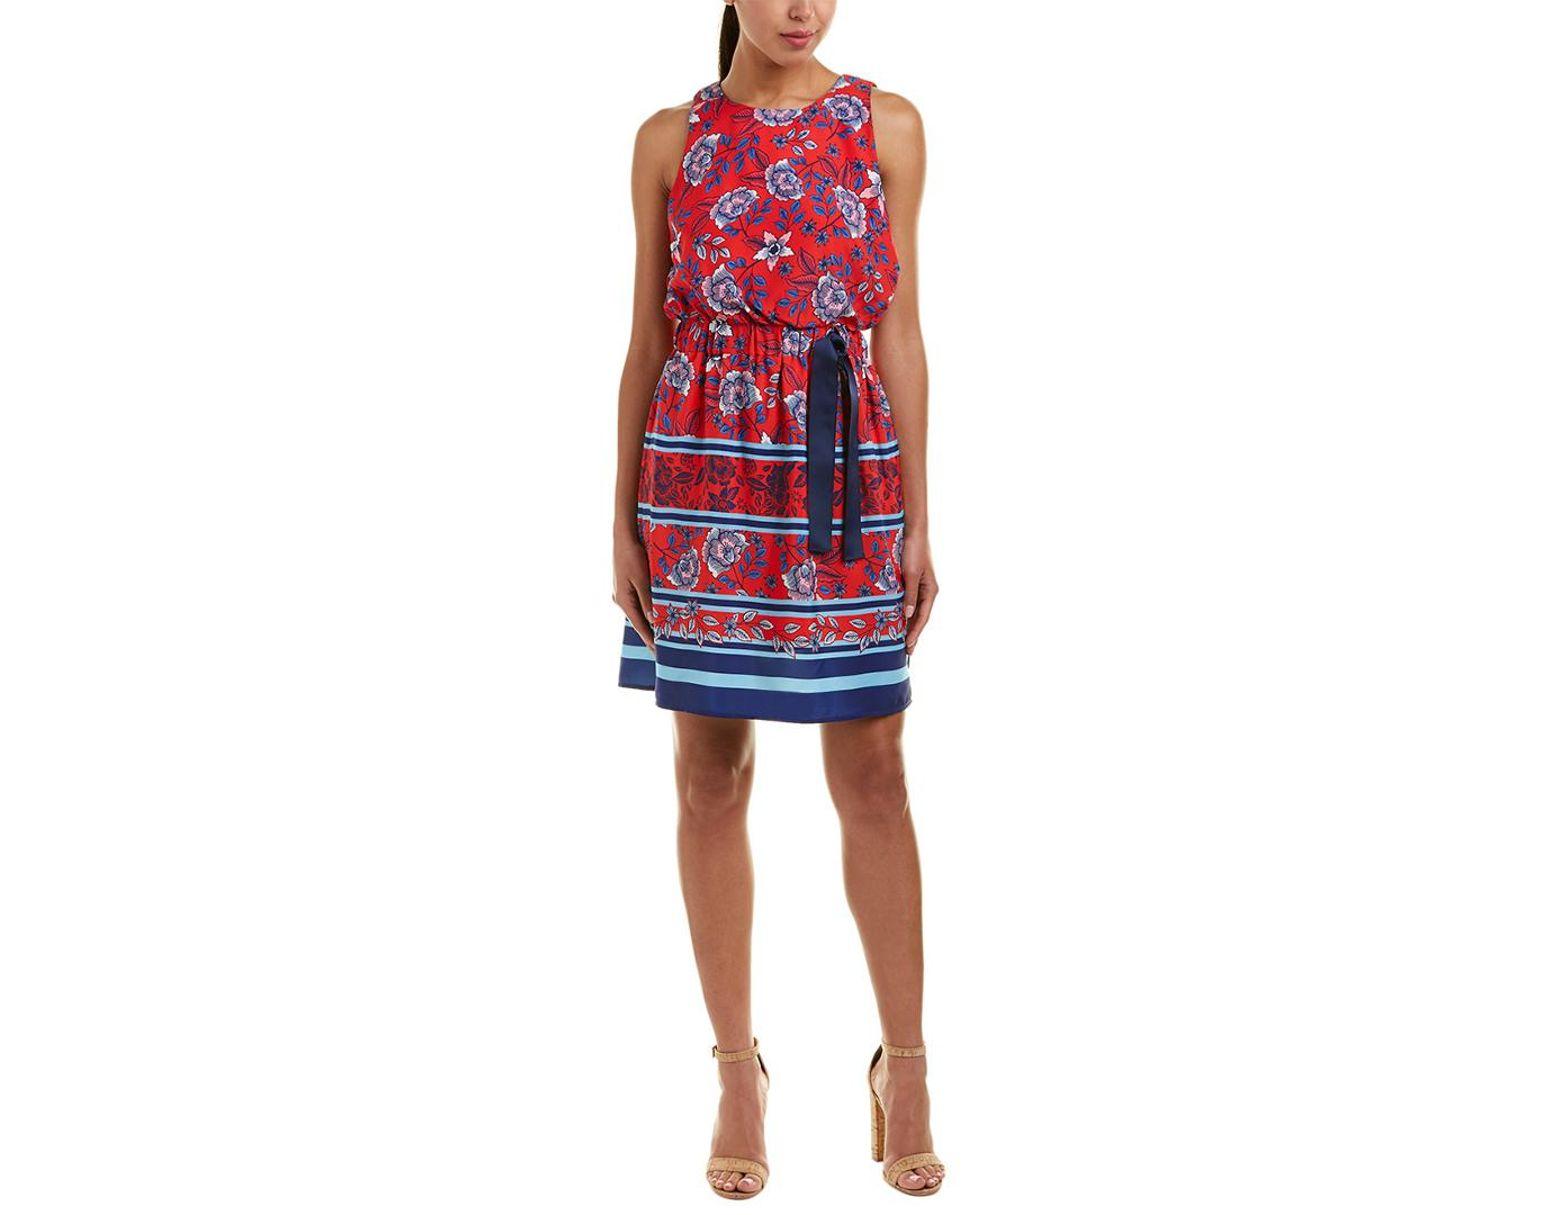 930a8b0cb48d Eliza J A-line Dress in Red - Save 70% - Lyst